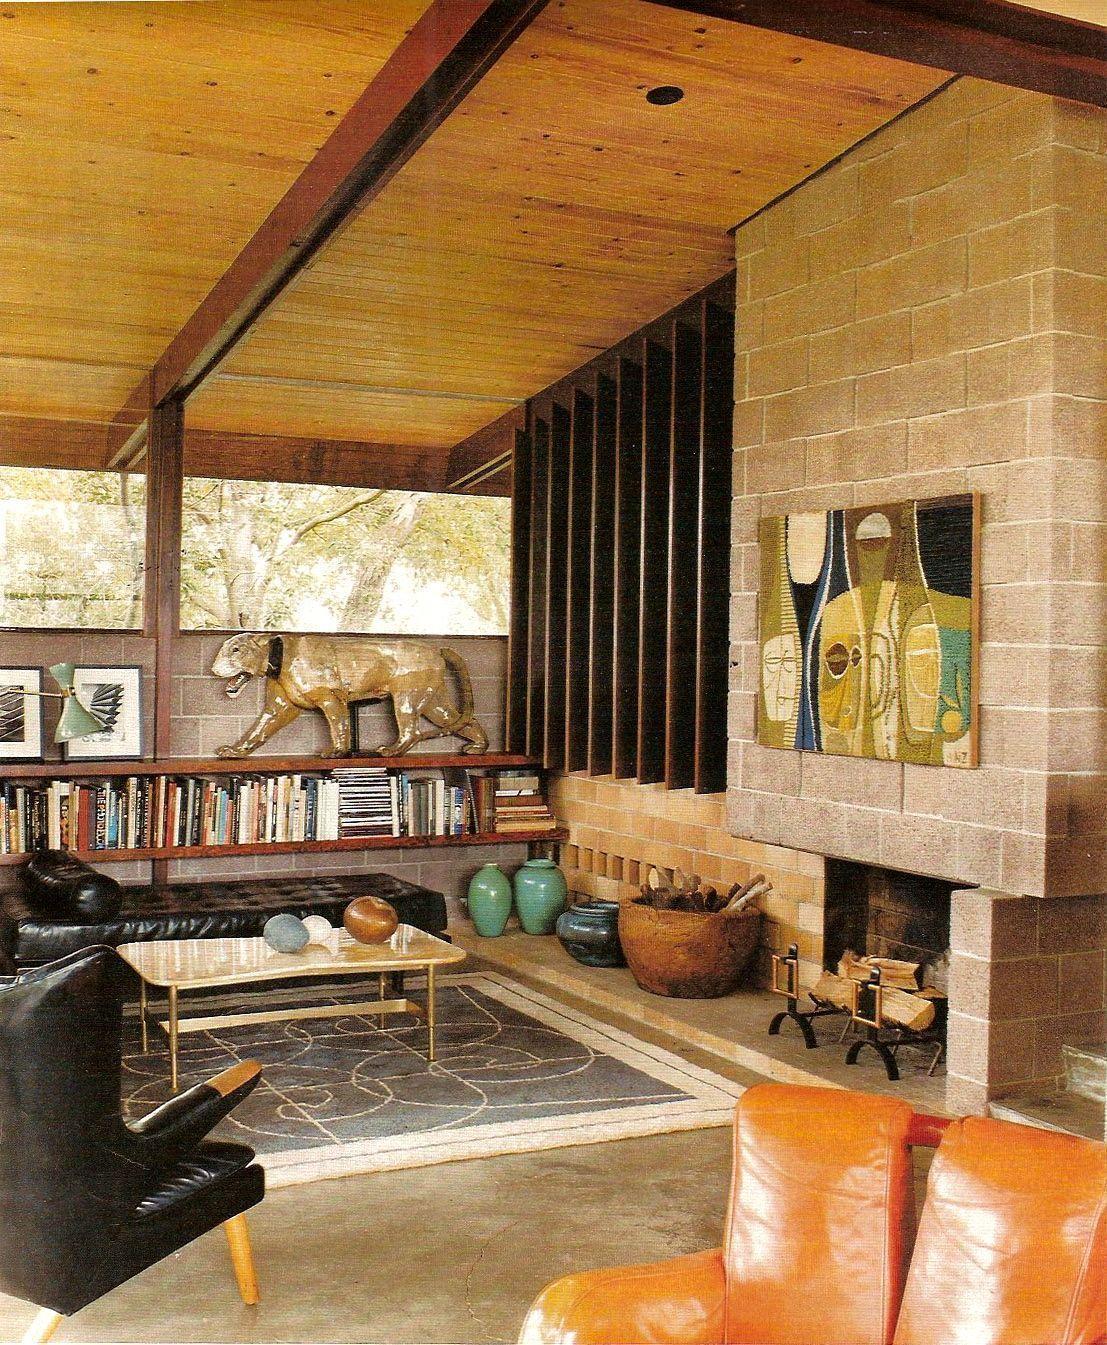 Bookshelves On Wall Los Angeles Times Magazine Vintage Interior De Mid Century Modern Interior Design Mid Century Modern Interiors Mid Century Modern House